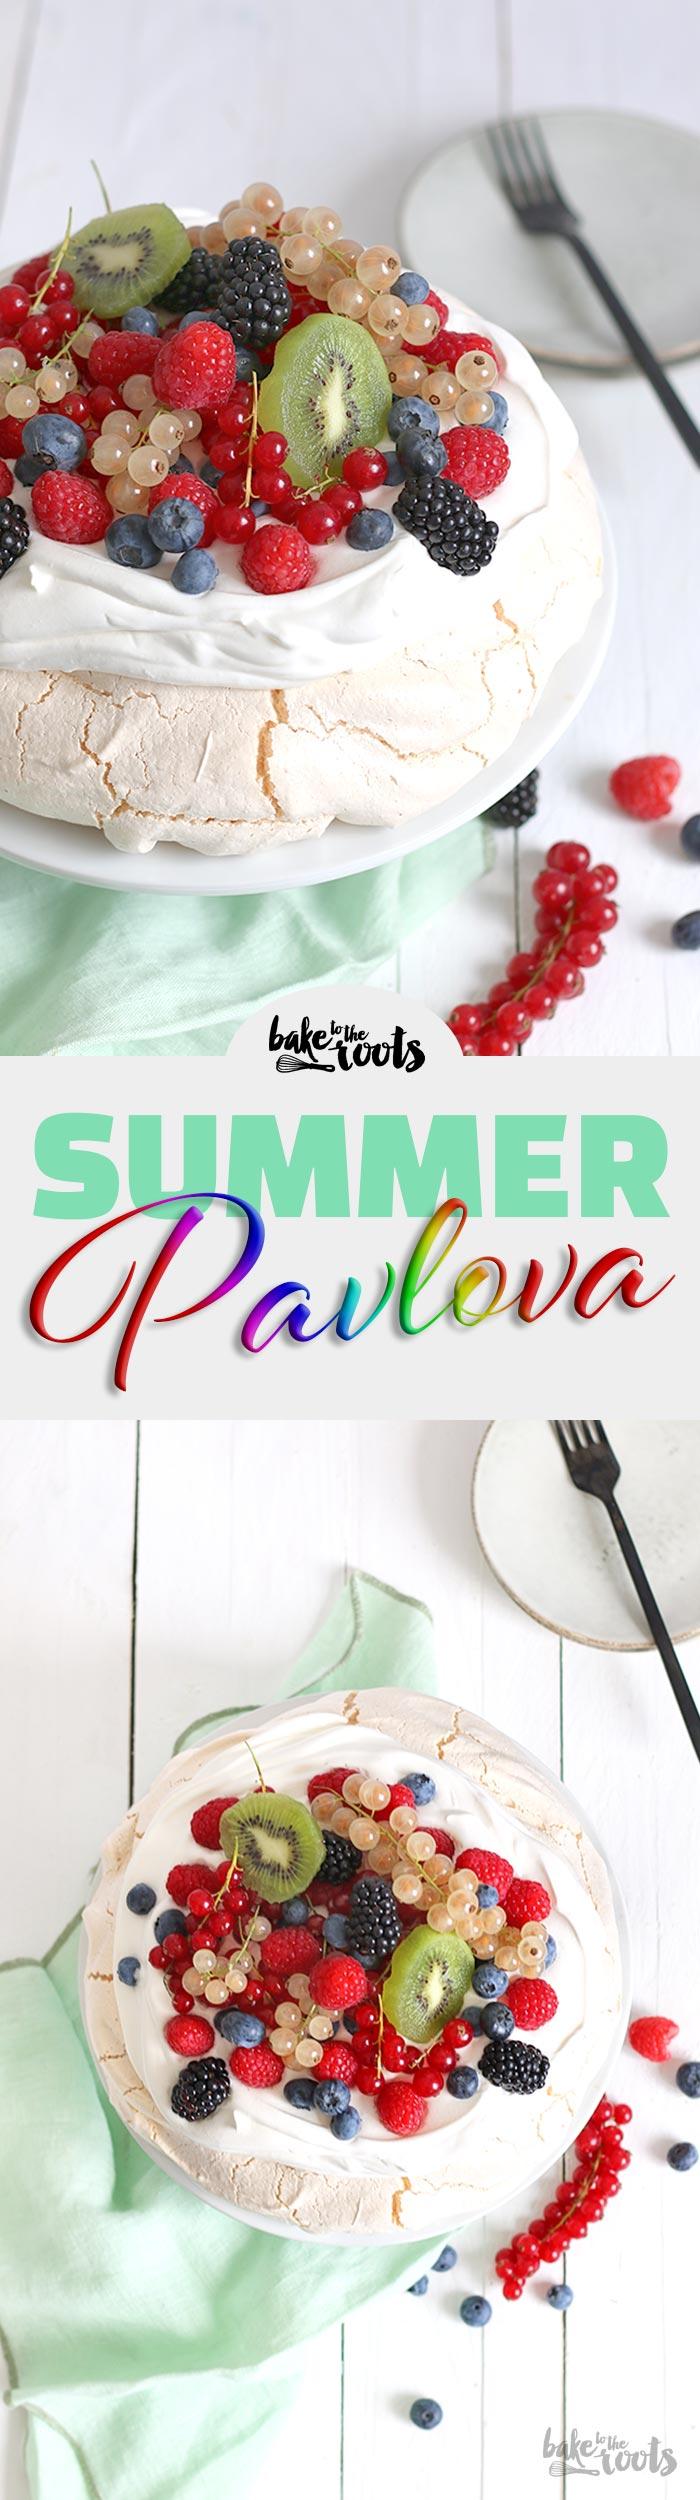 Summer Pavlova | Bake to the roots